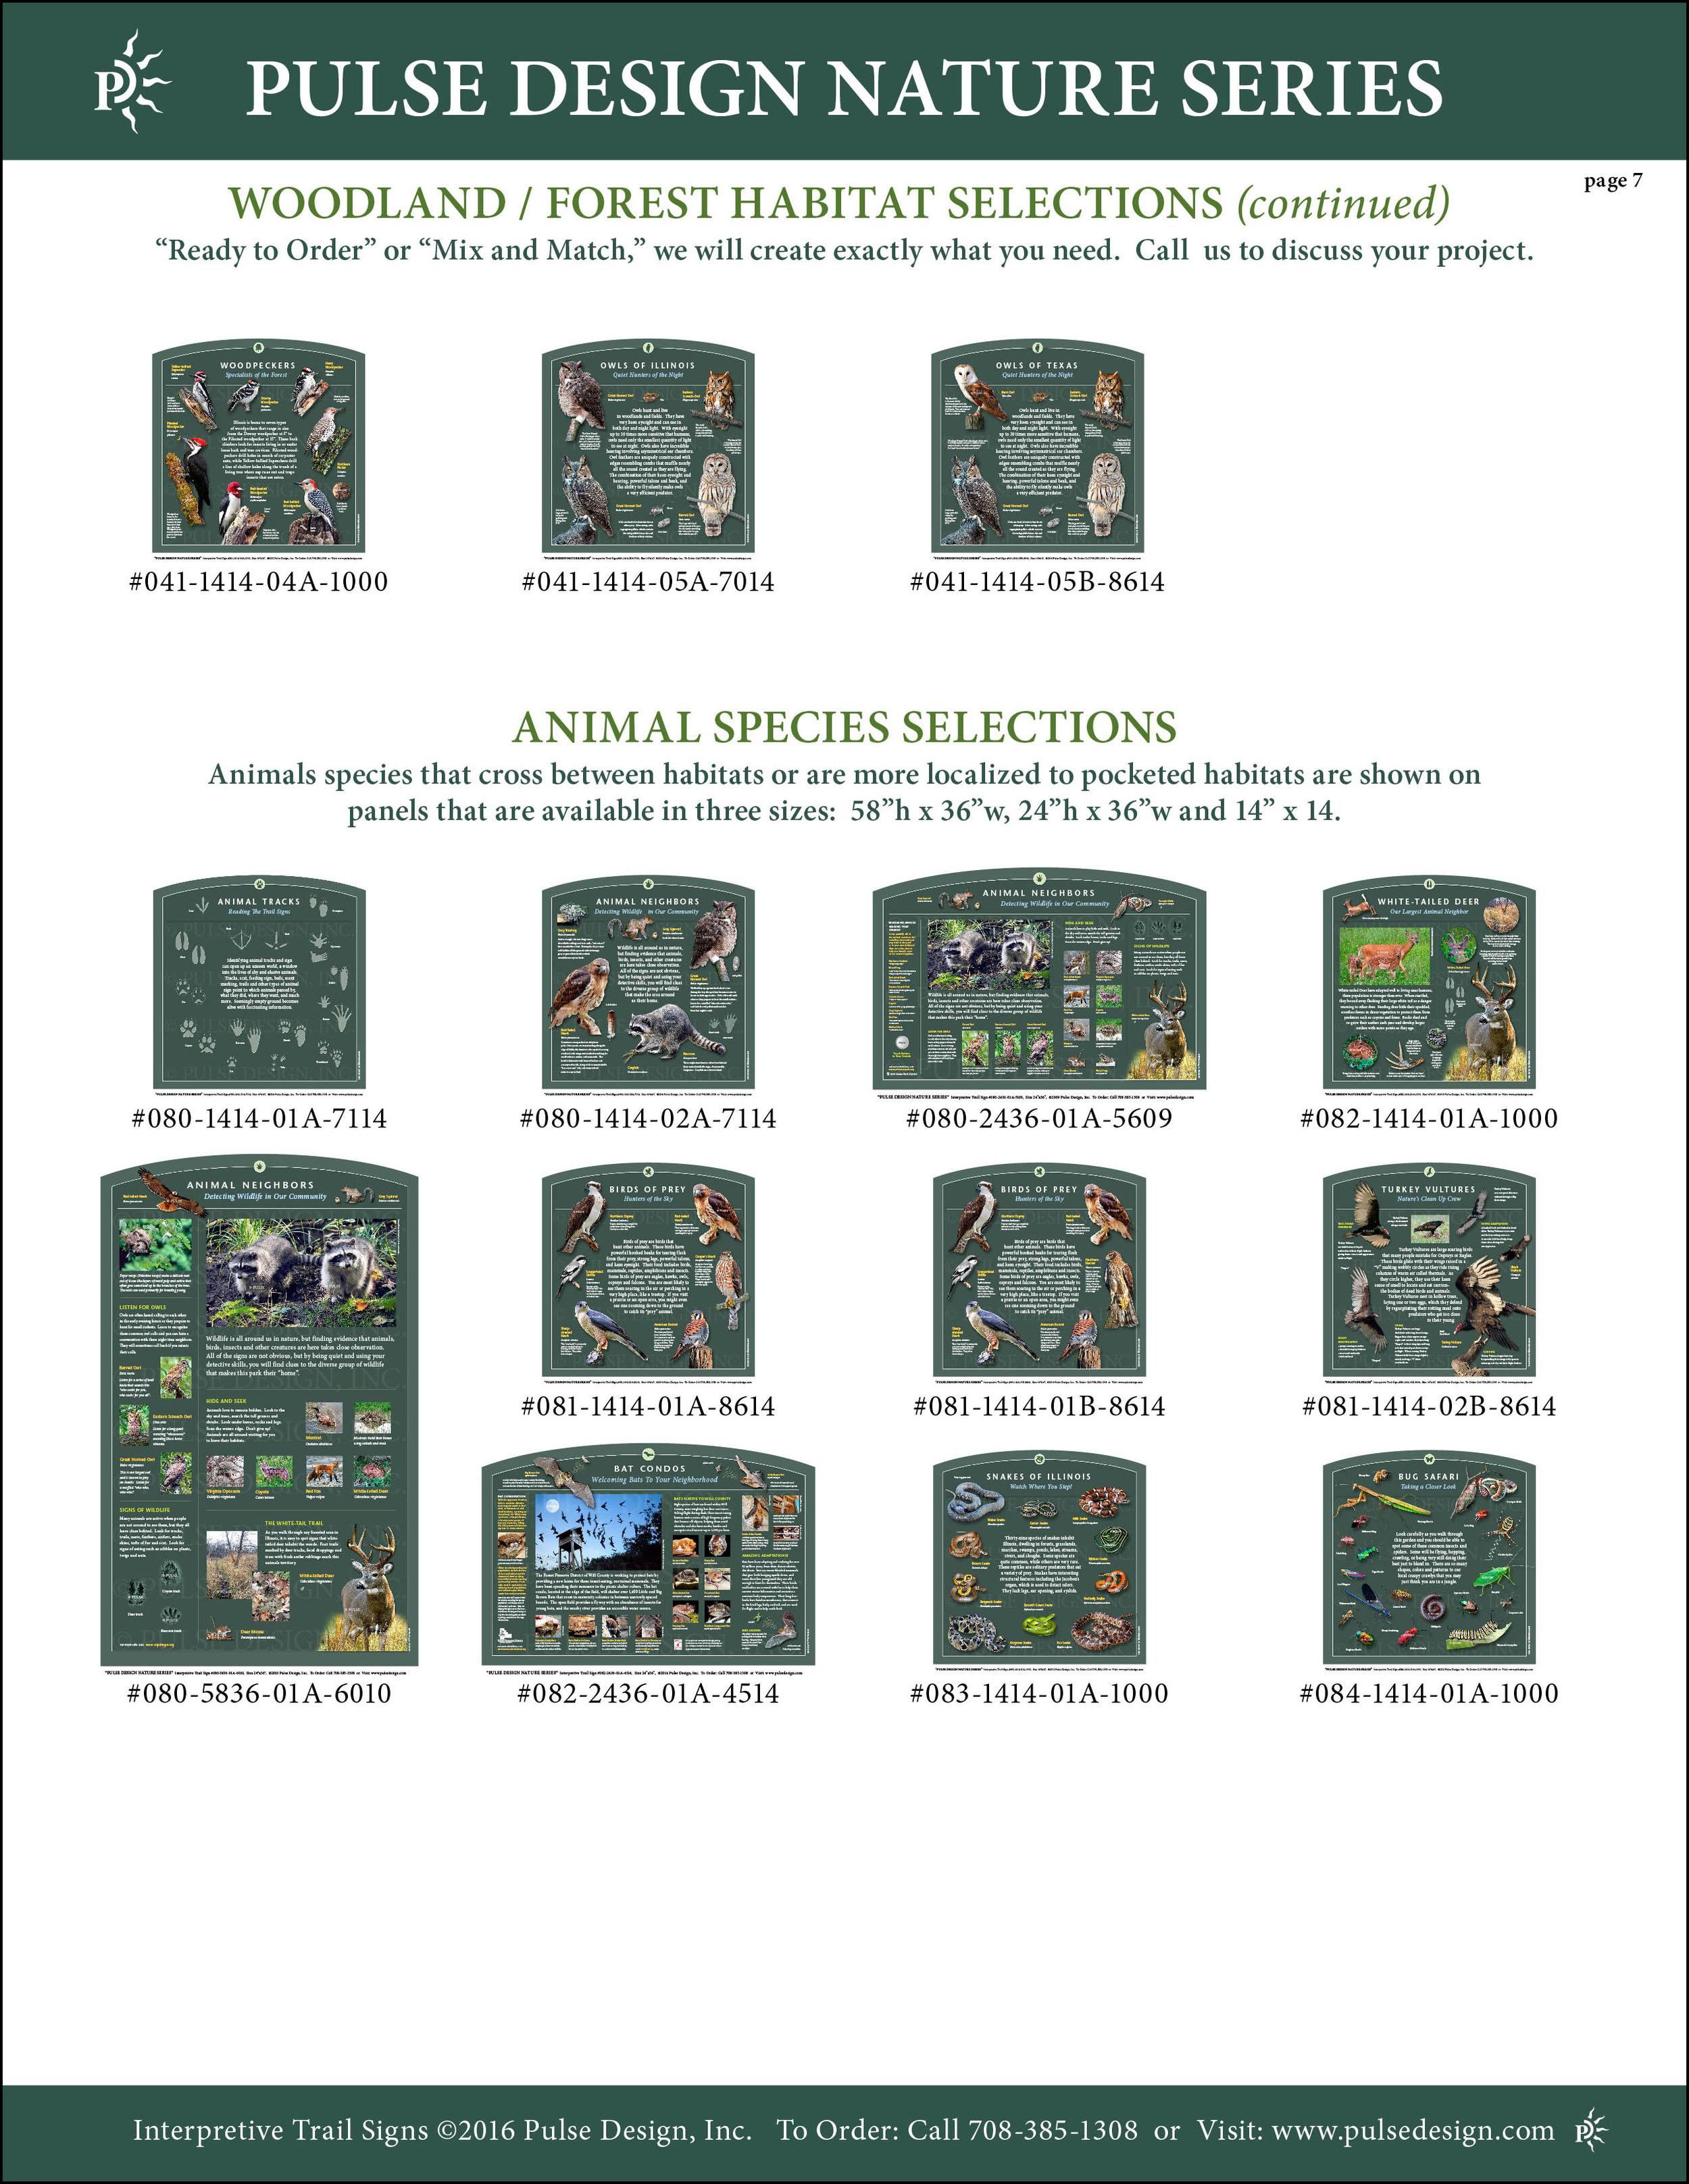 PULSE DESIGN NATURE SERIES CATALOG 2016 07.jpg